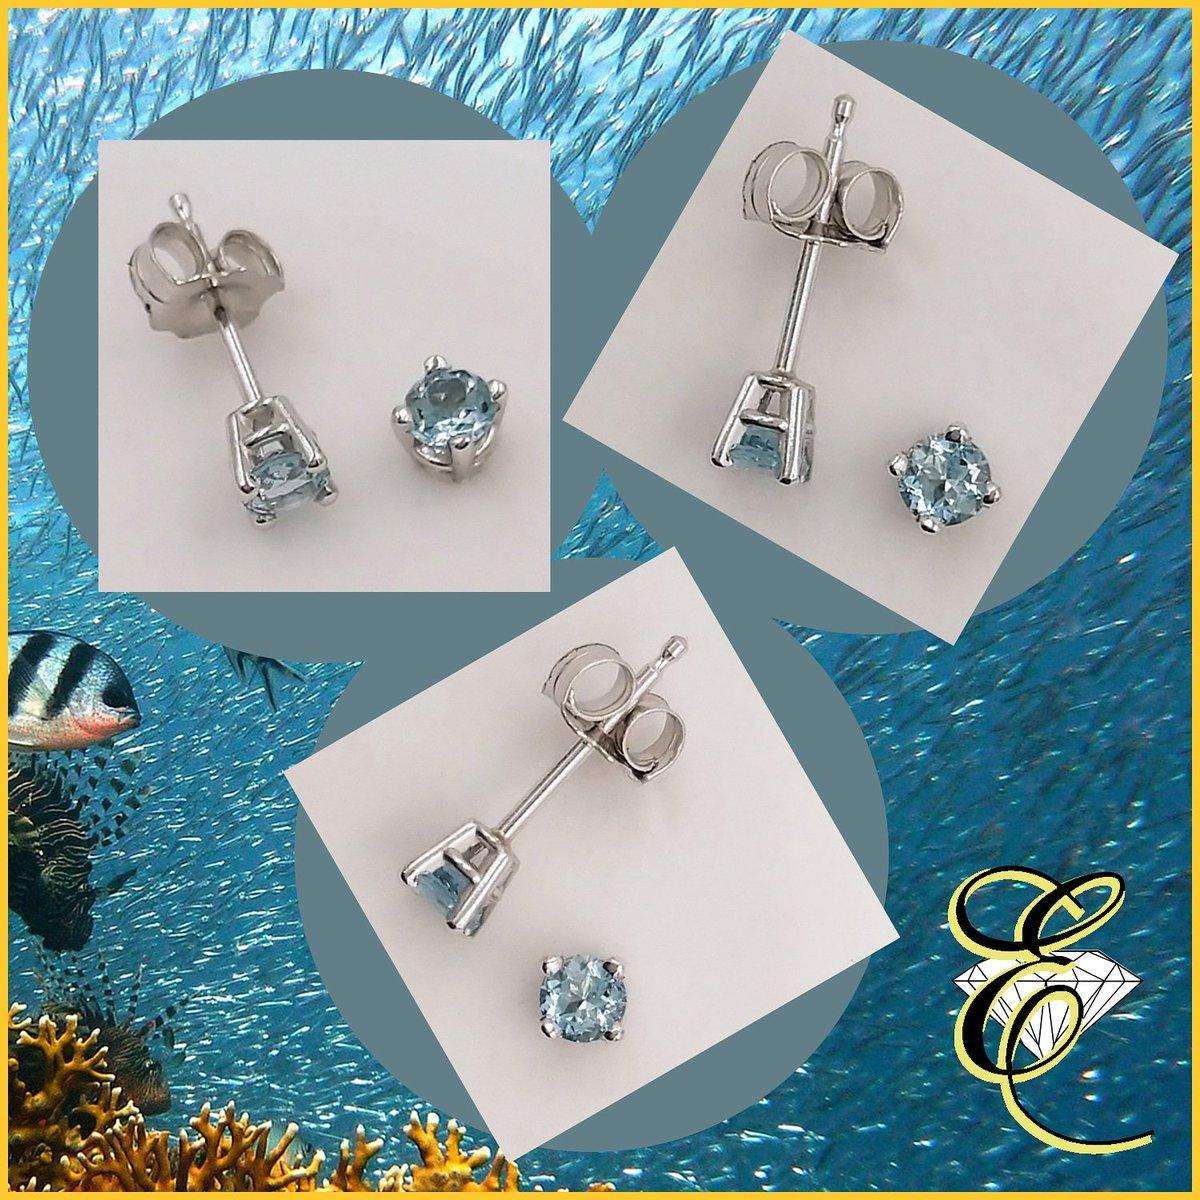 d79c5c36f2746 aquamarinejewelry hashtag on Twitter